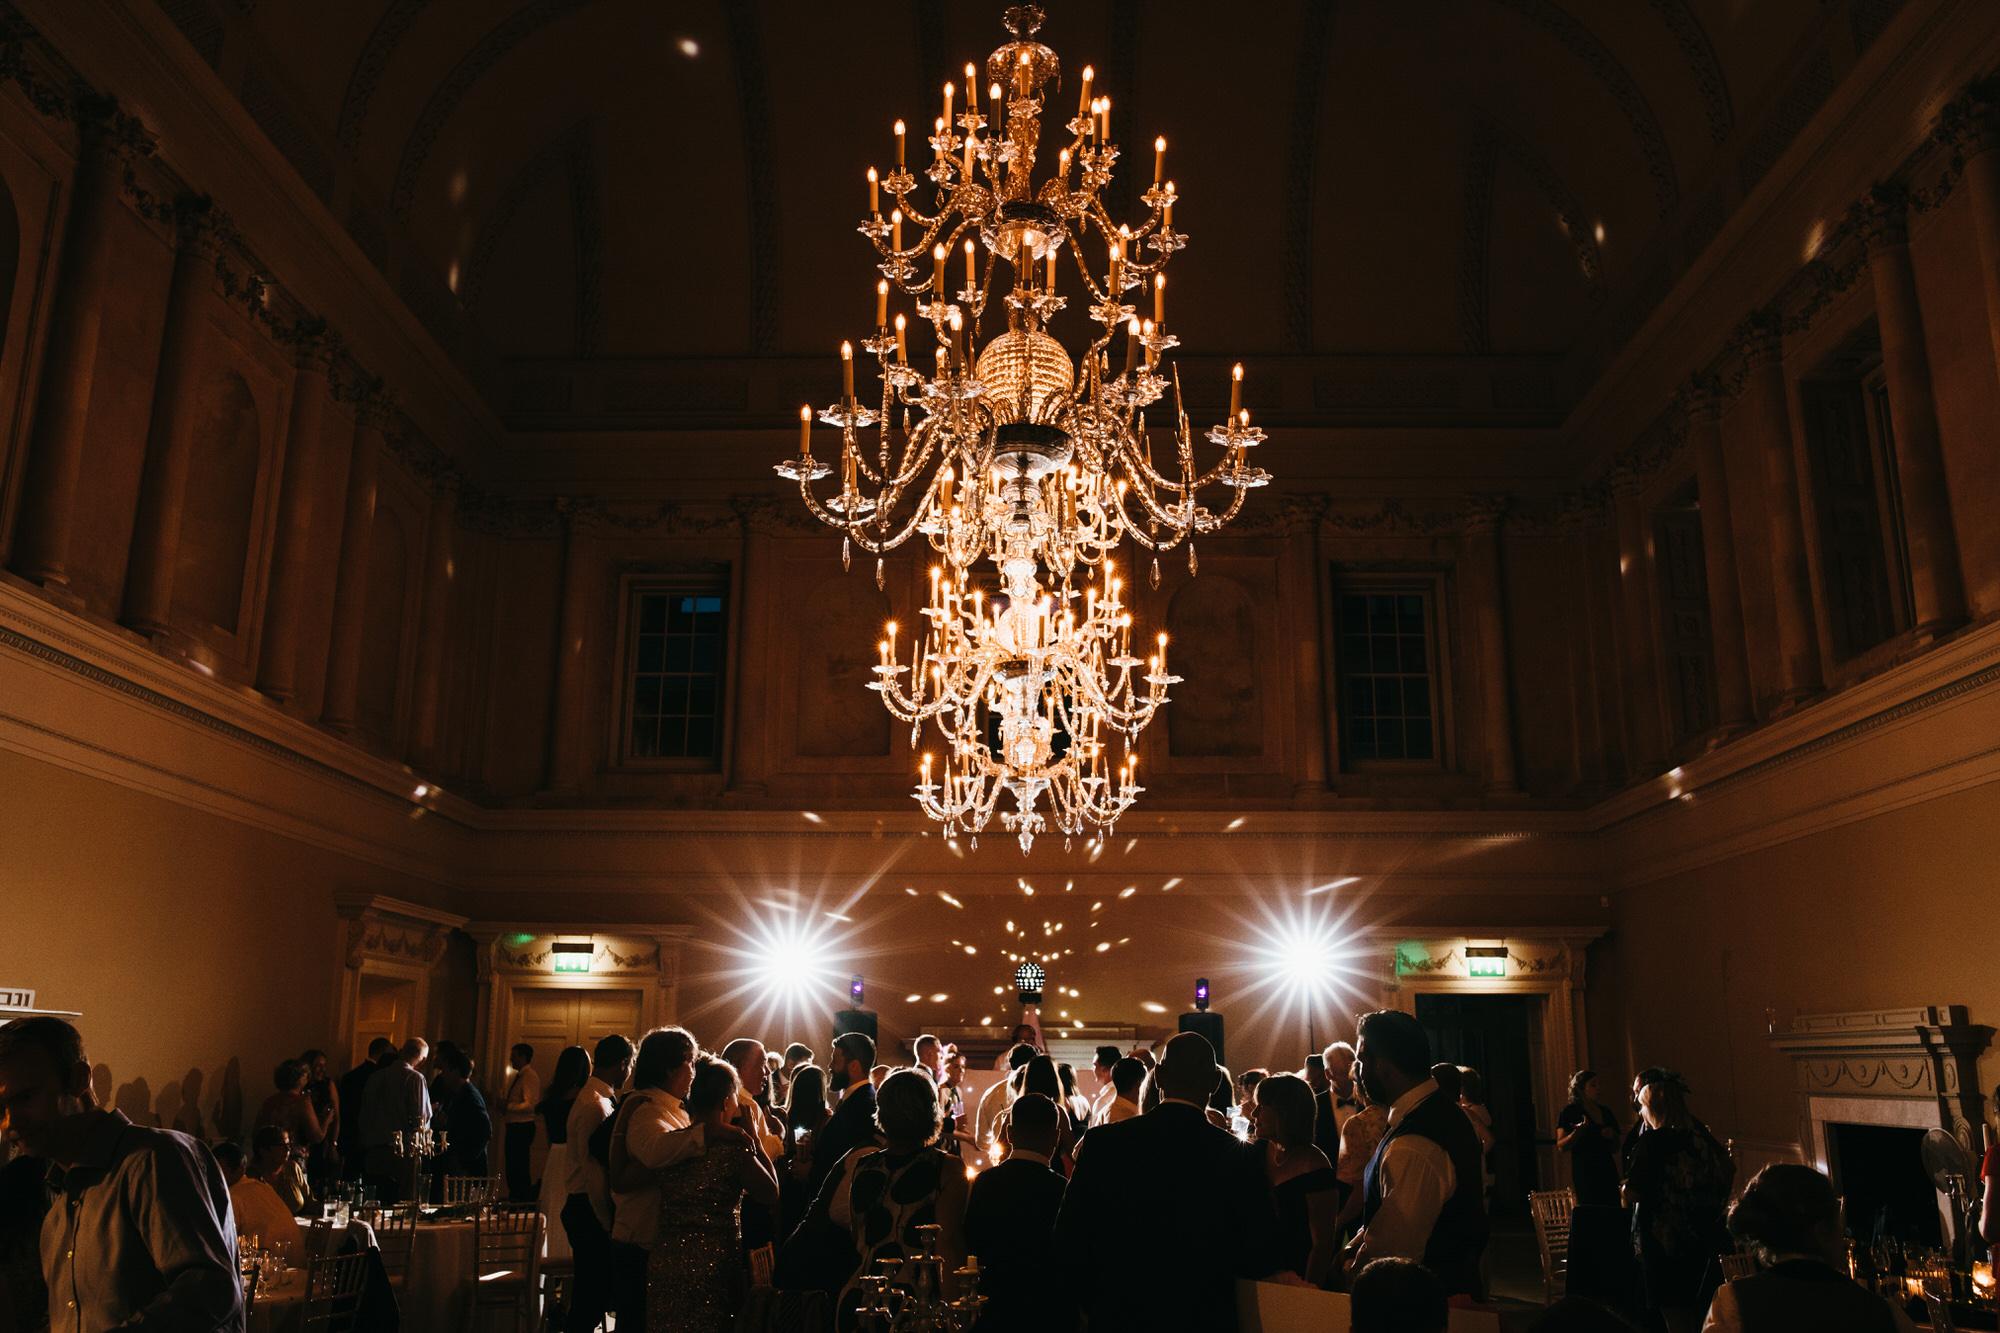 Assembly rooms bath wedding venue simon biffen photography 15